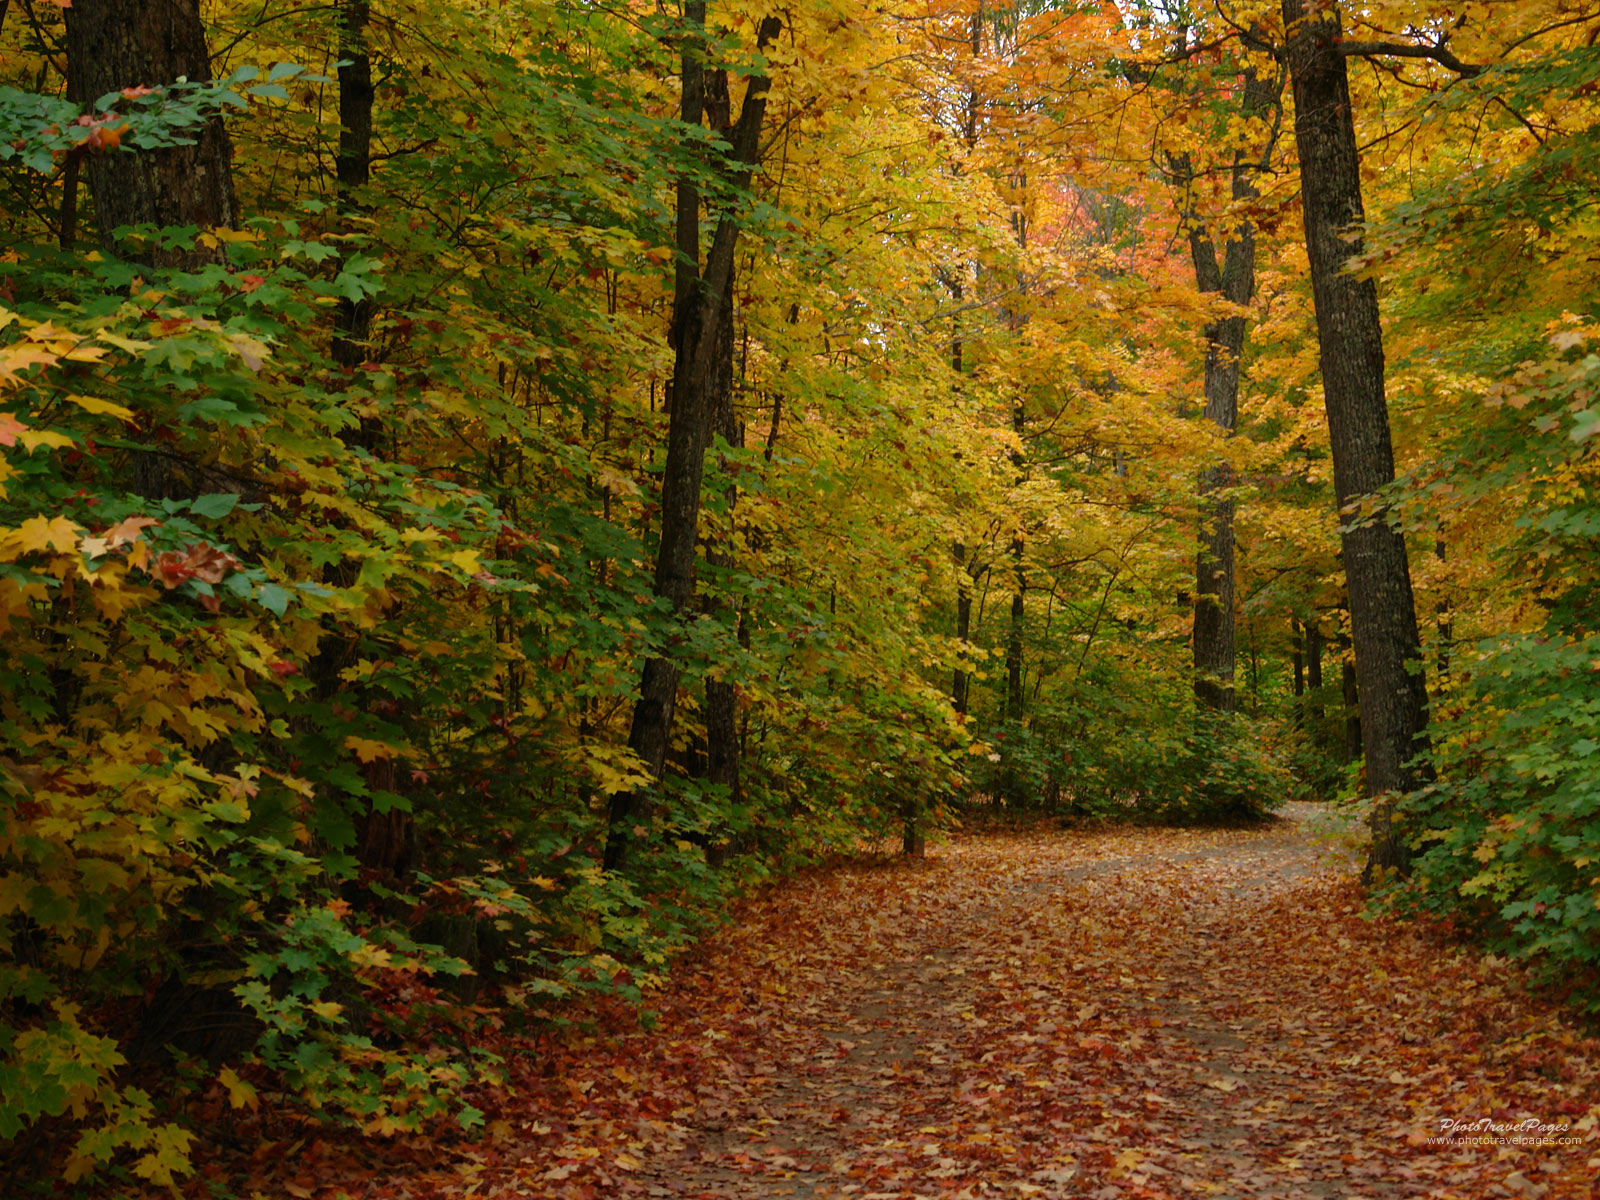 autumn road green starting to fall leafs desktop wallpaper 1600x1200